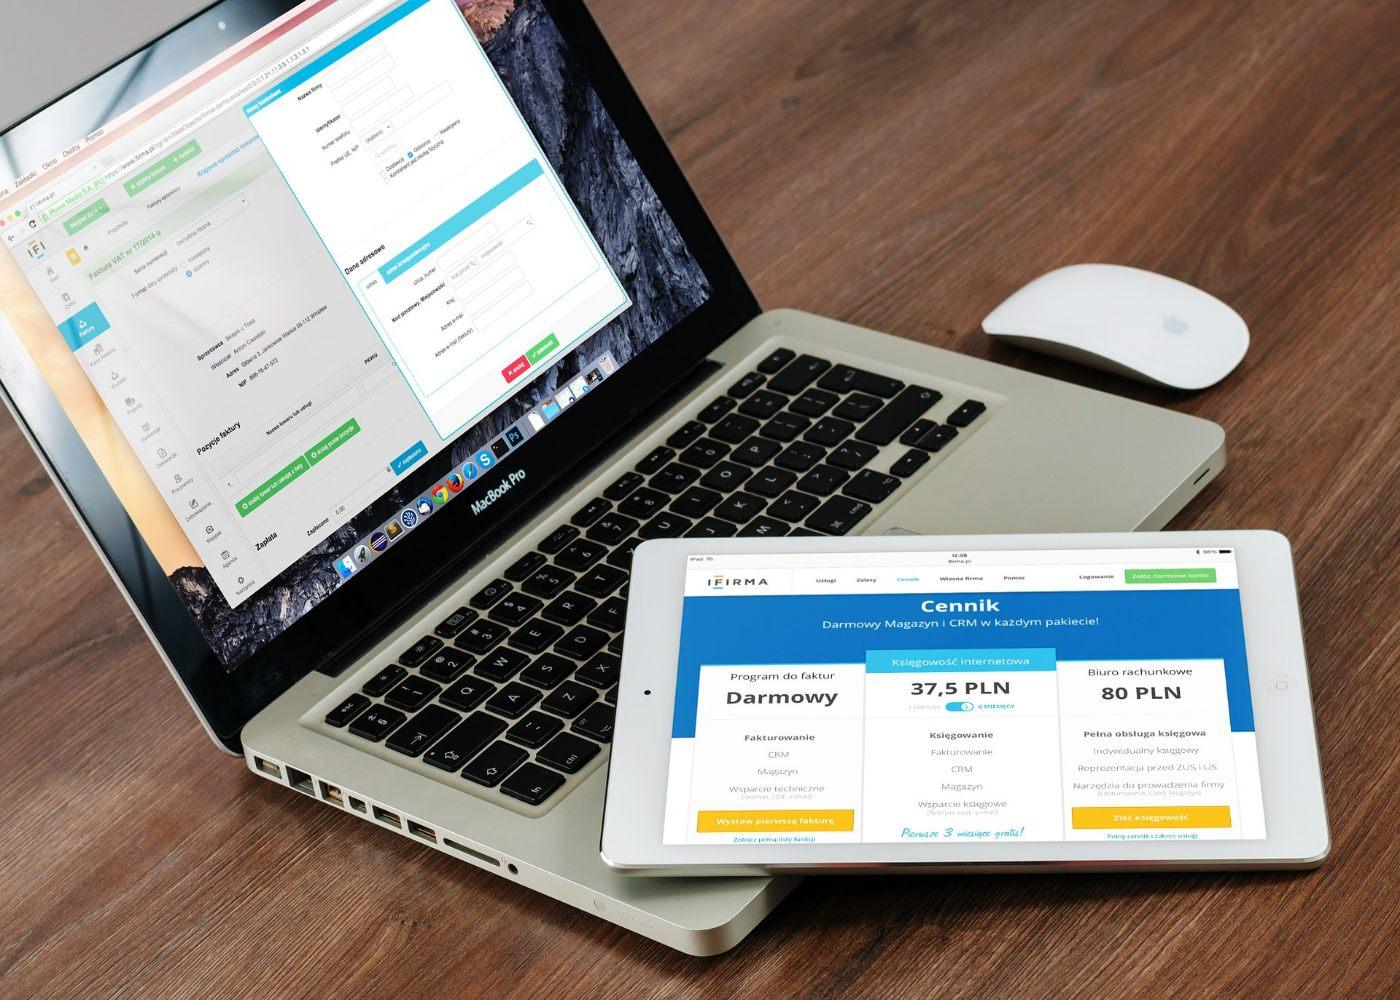 web design agency dubai